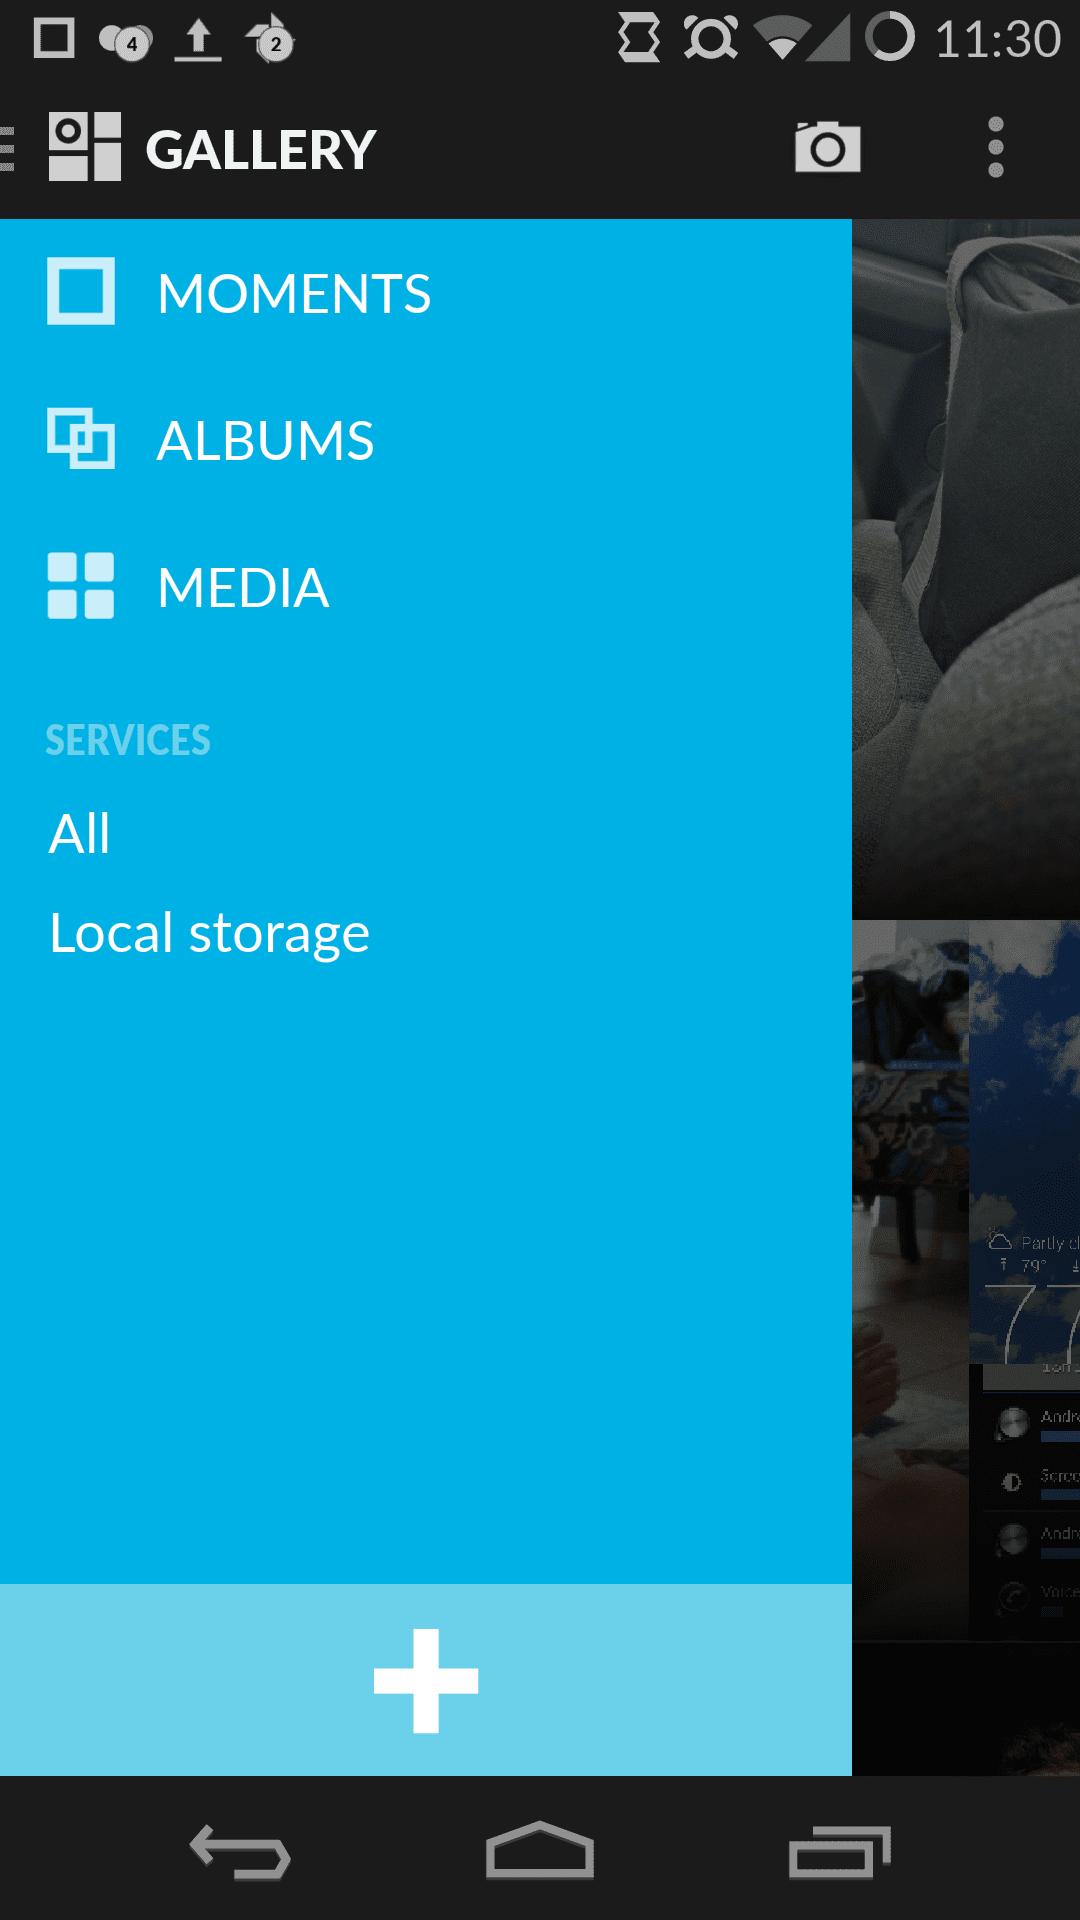 Screenshot 2014 07 03 23 30 30